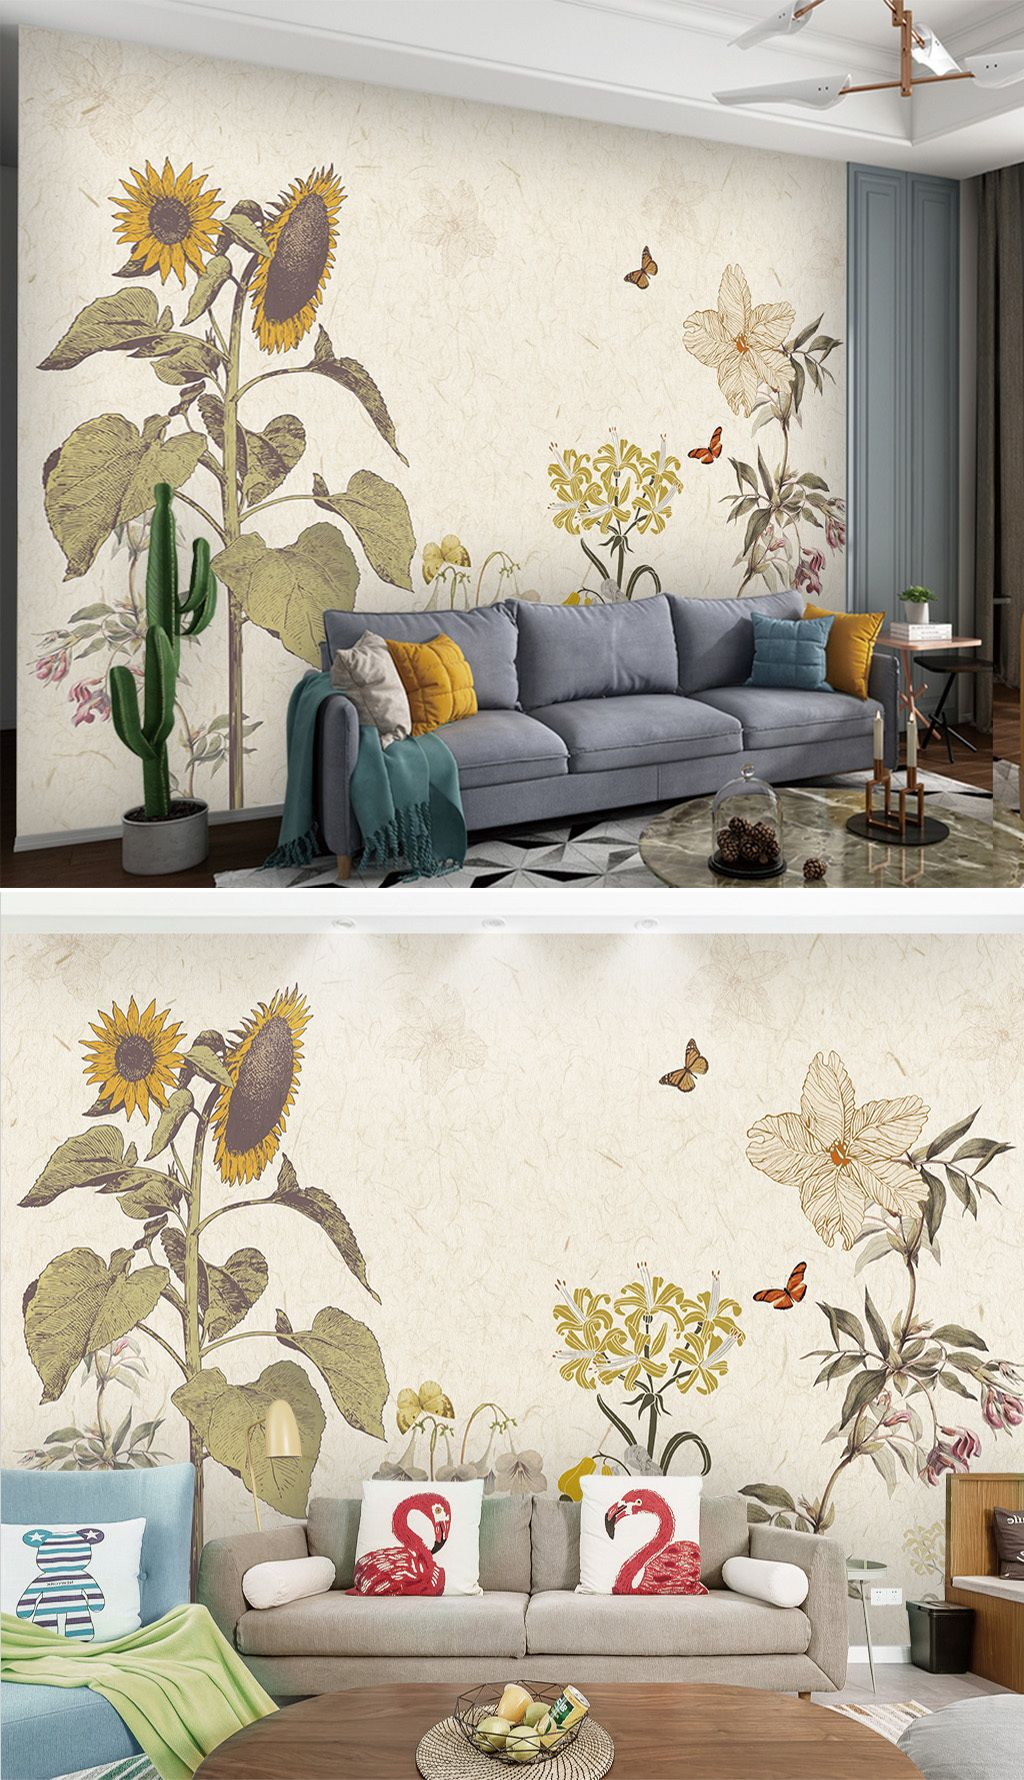 American Vintage Sunflower Living Room Murals Wallpaper Wallpapers Interiordesign Decoration Interior Interiordec Living Room Murals Wall Wallpaper Mural